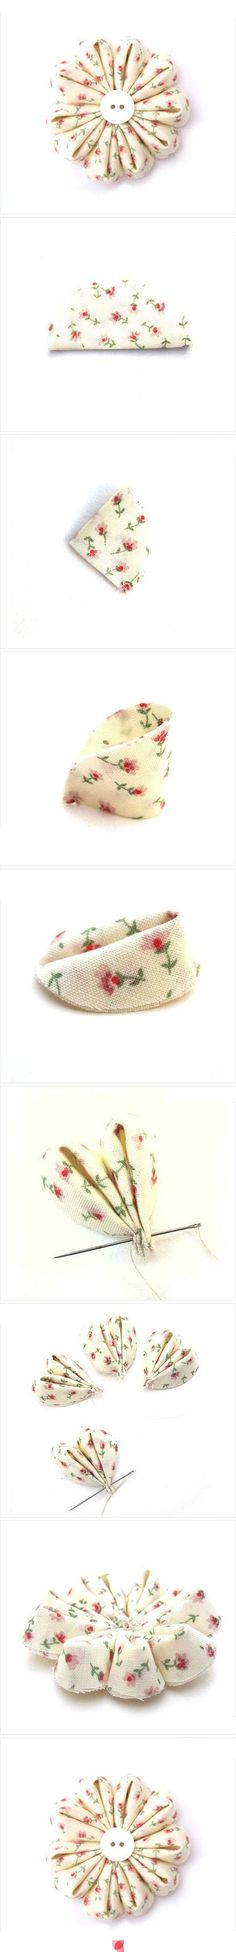 go go blog post HERE:  http://littlelivingstone.blogspot.com/2012/01/how-to-make-fabric-gerbera-daisy-flower.html